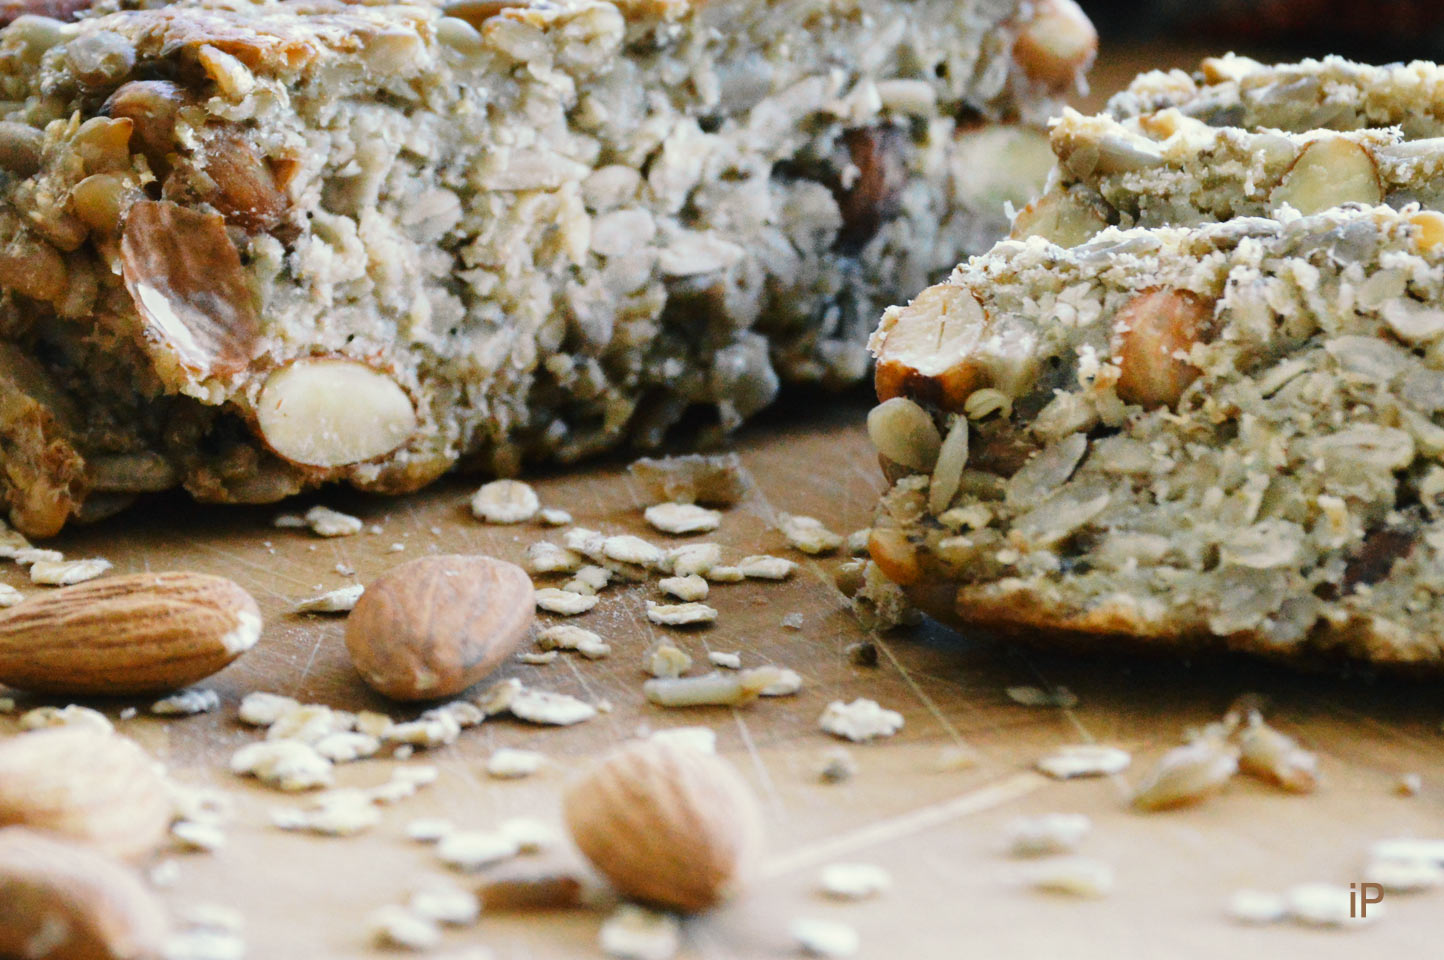 selbstgebackenes Brot mit Sonnenblumenkernen statt Mehl